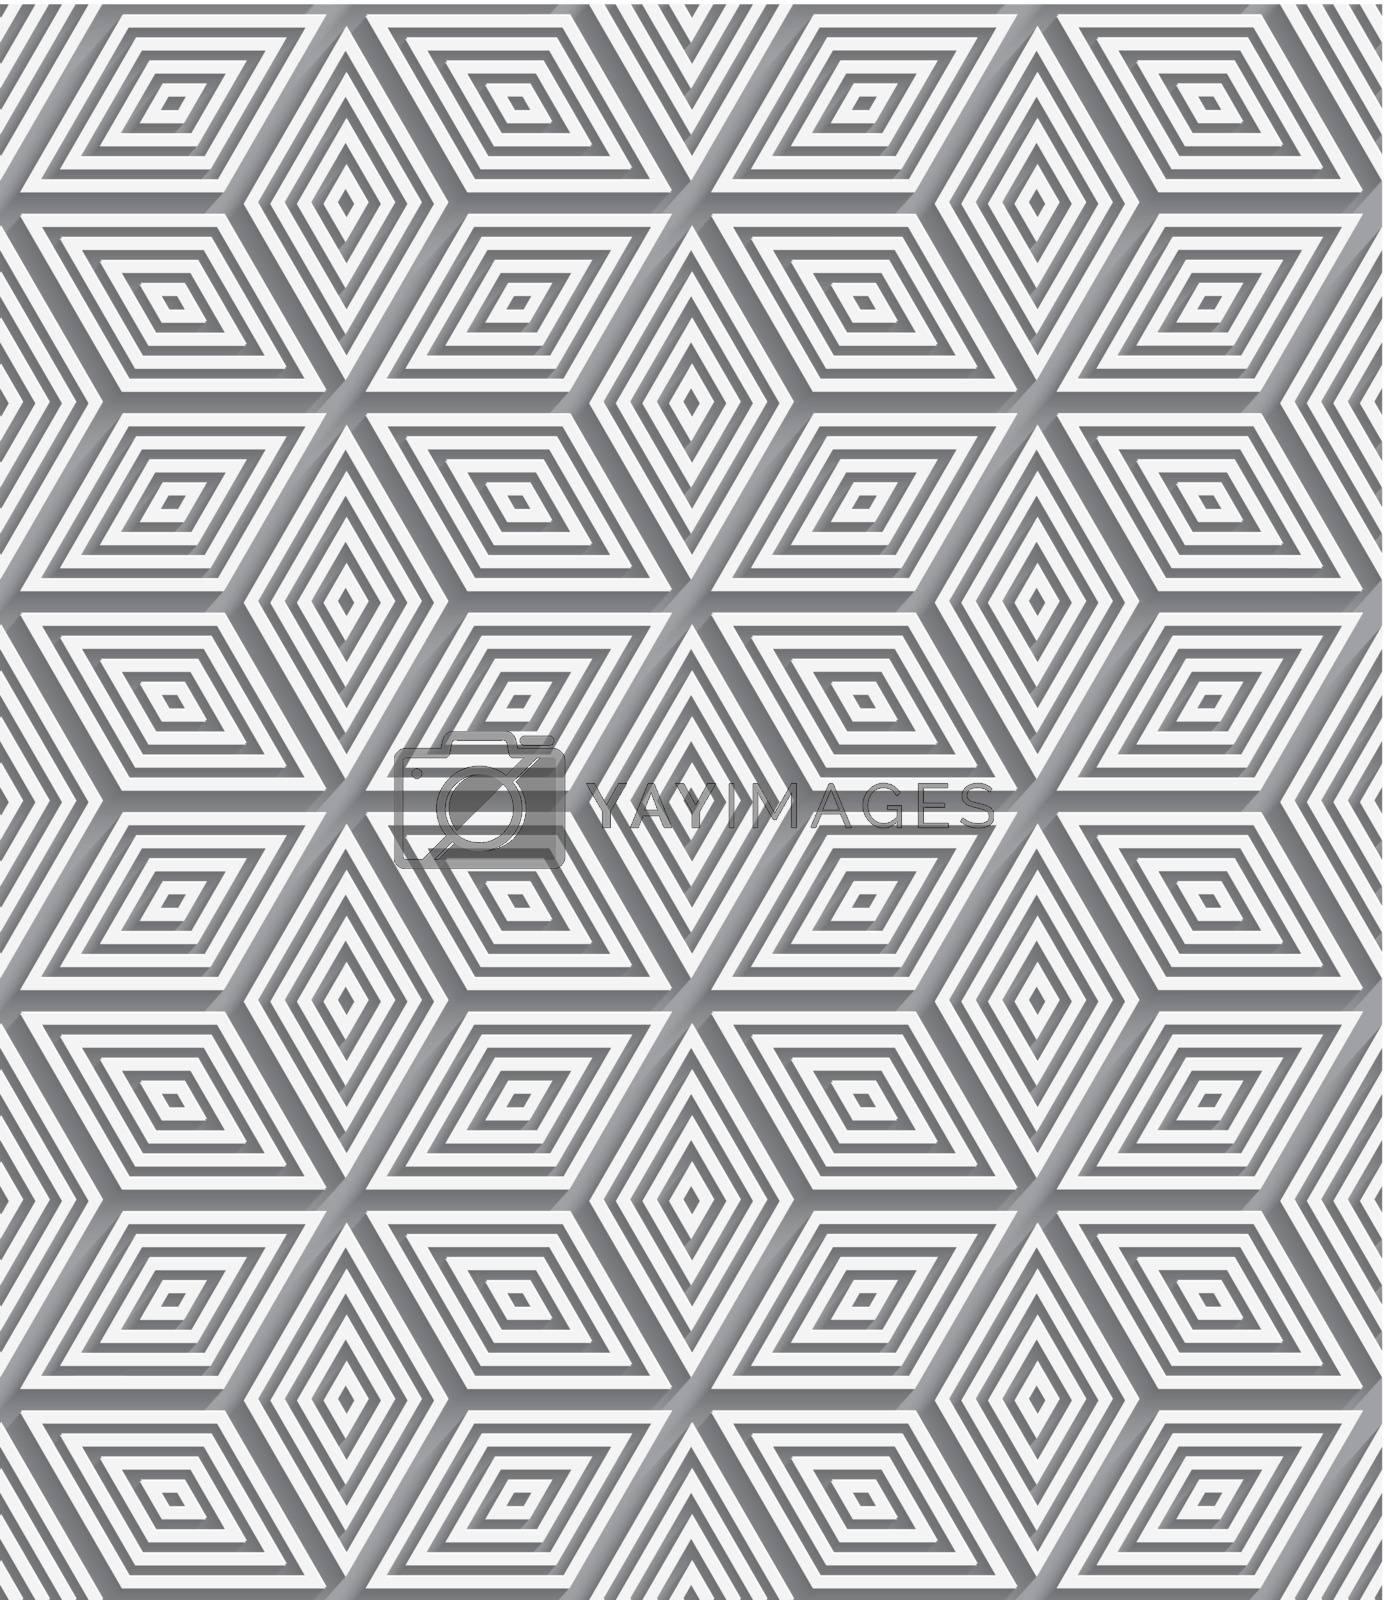 3d ornament paper cut out seamless by Zebra-Finch